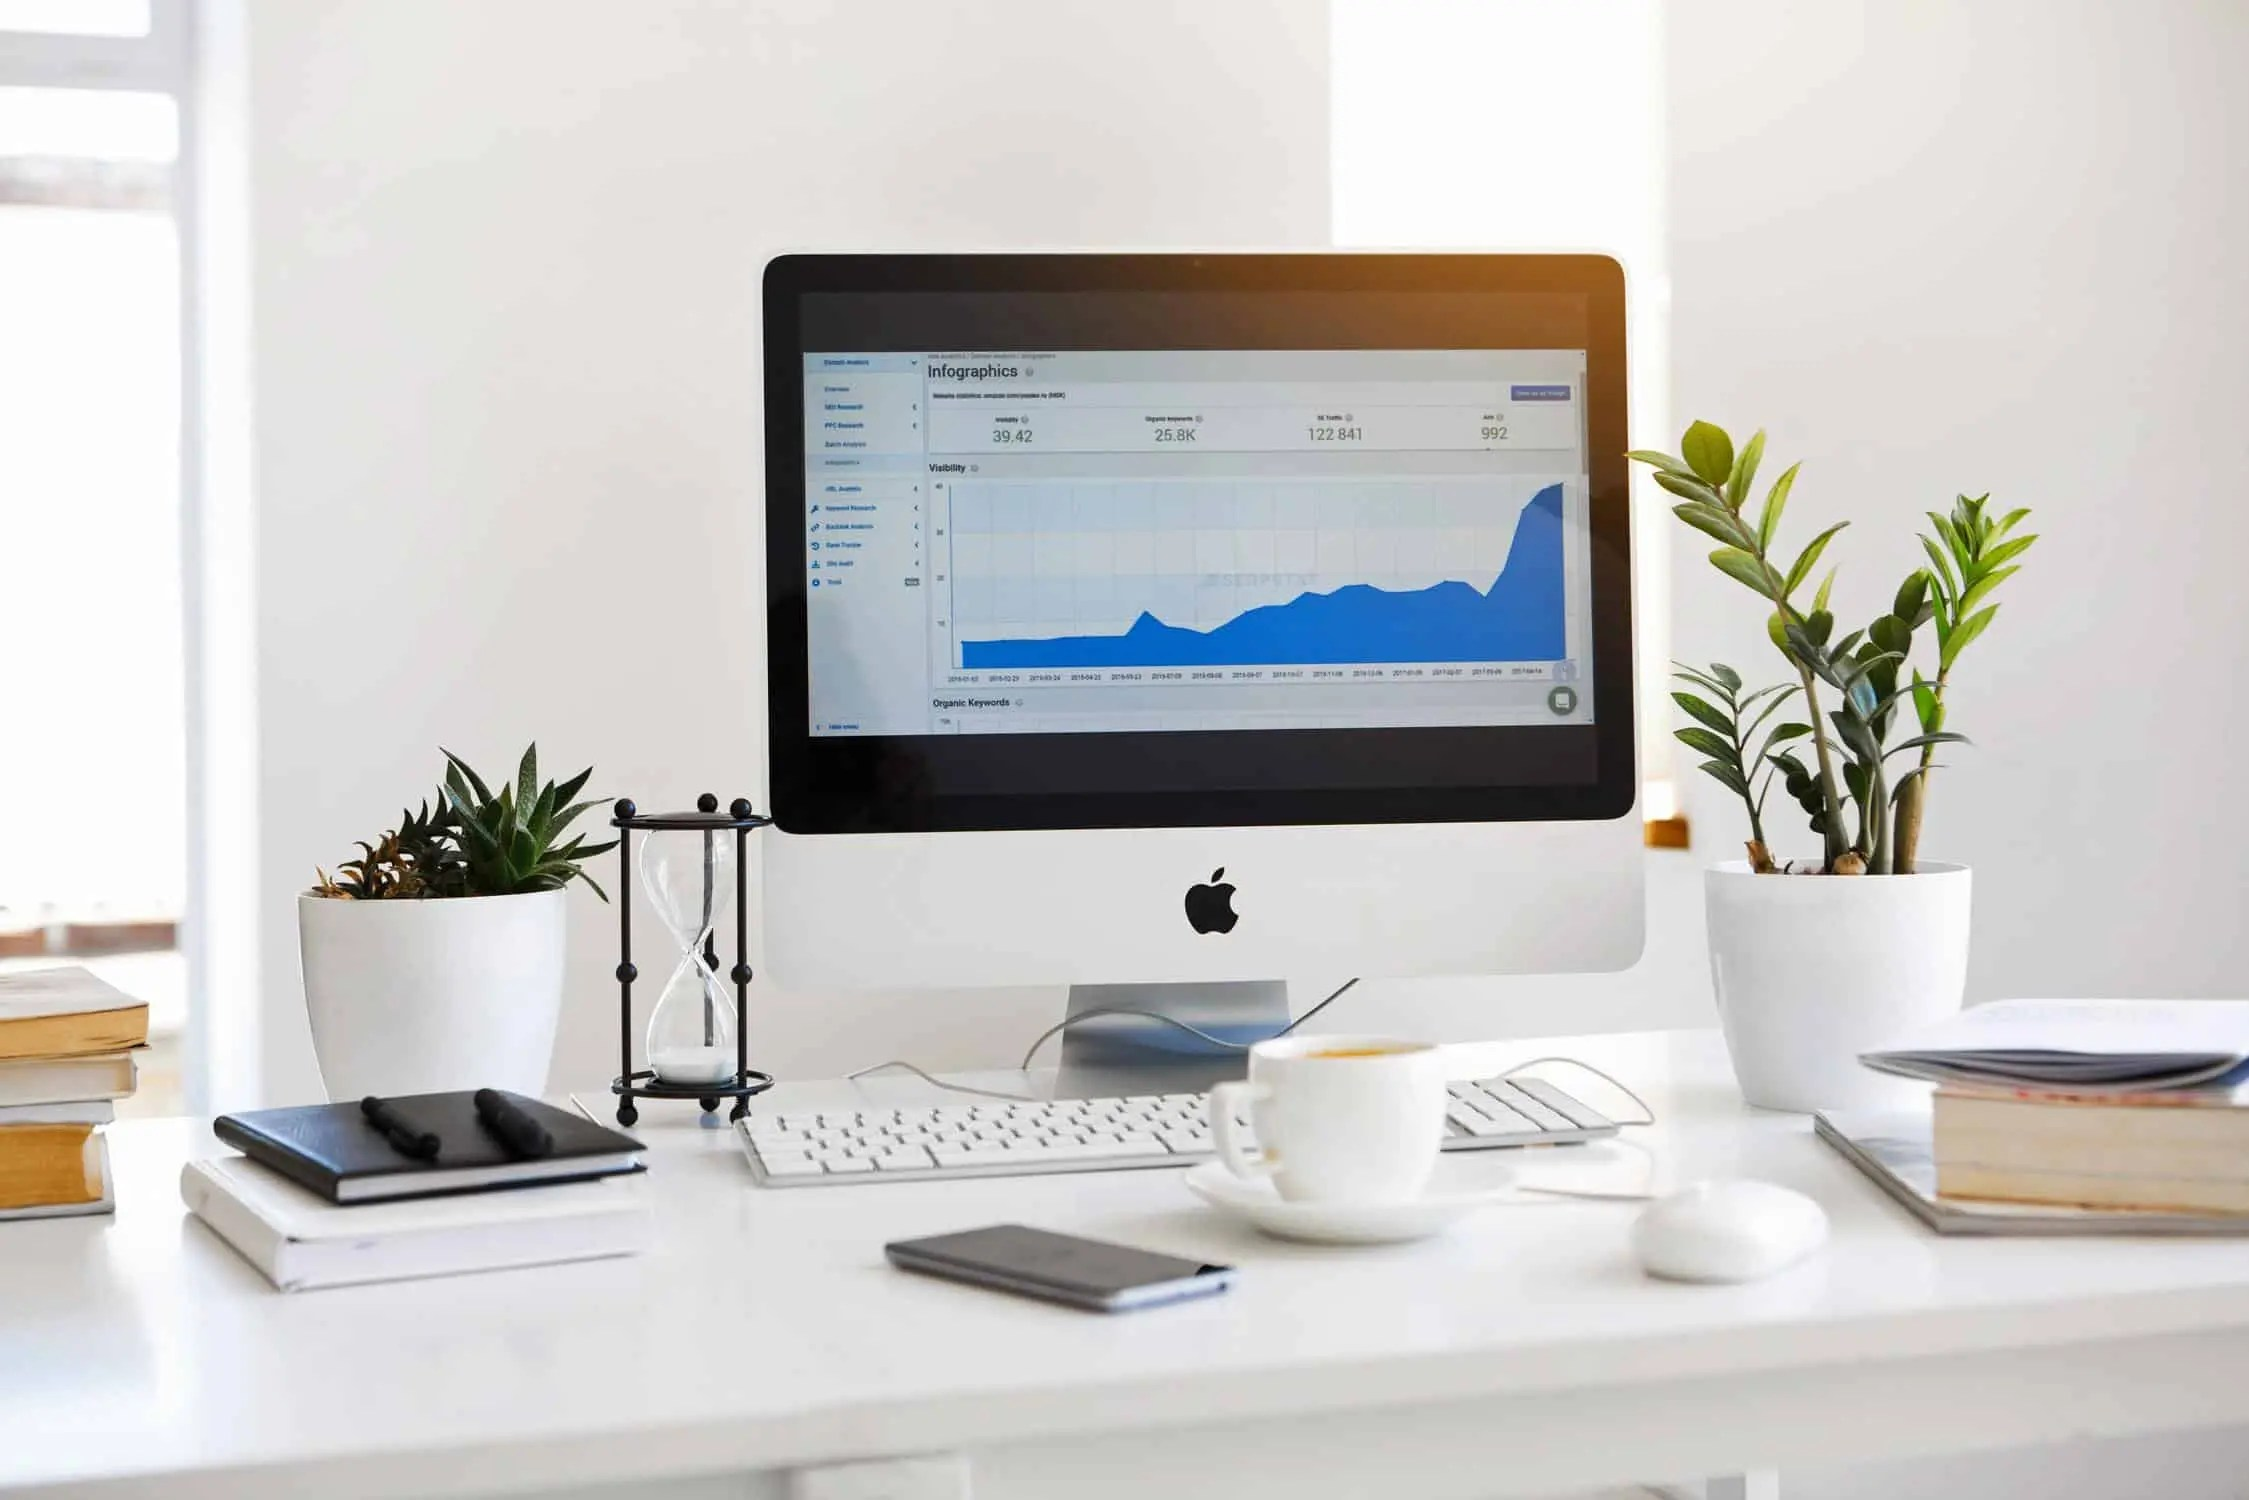 Wordpress Plugin Mistakes Beginner Bloggers Header Image Of Mac On Bright White Desk